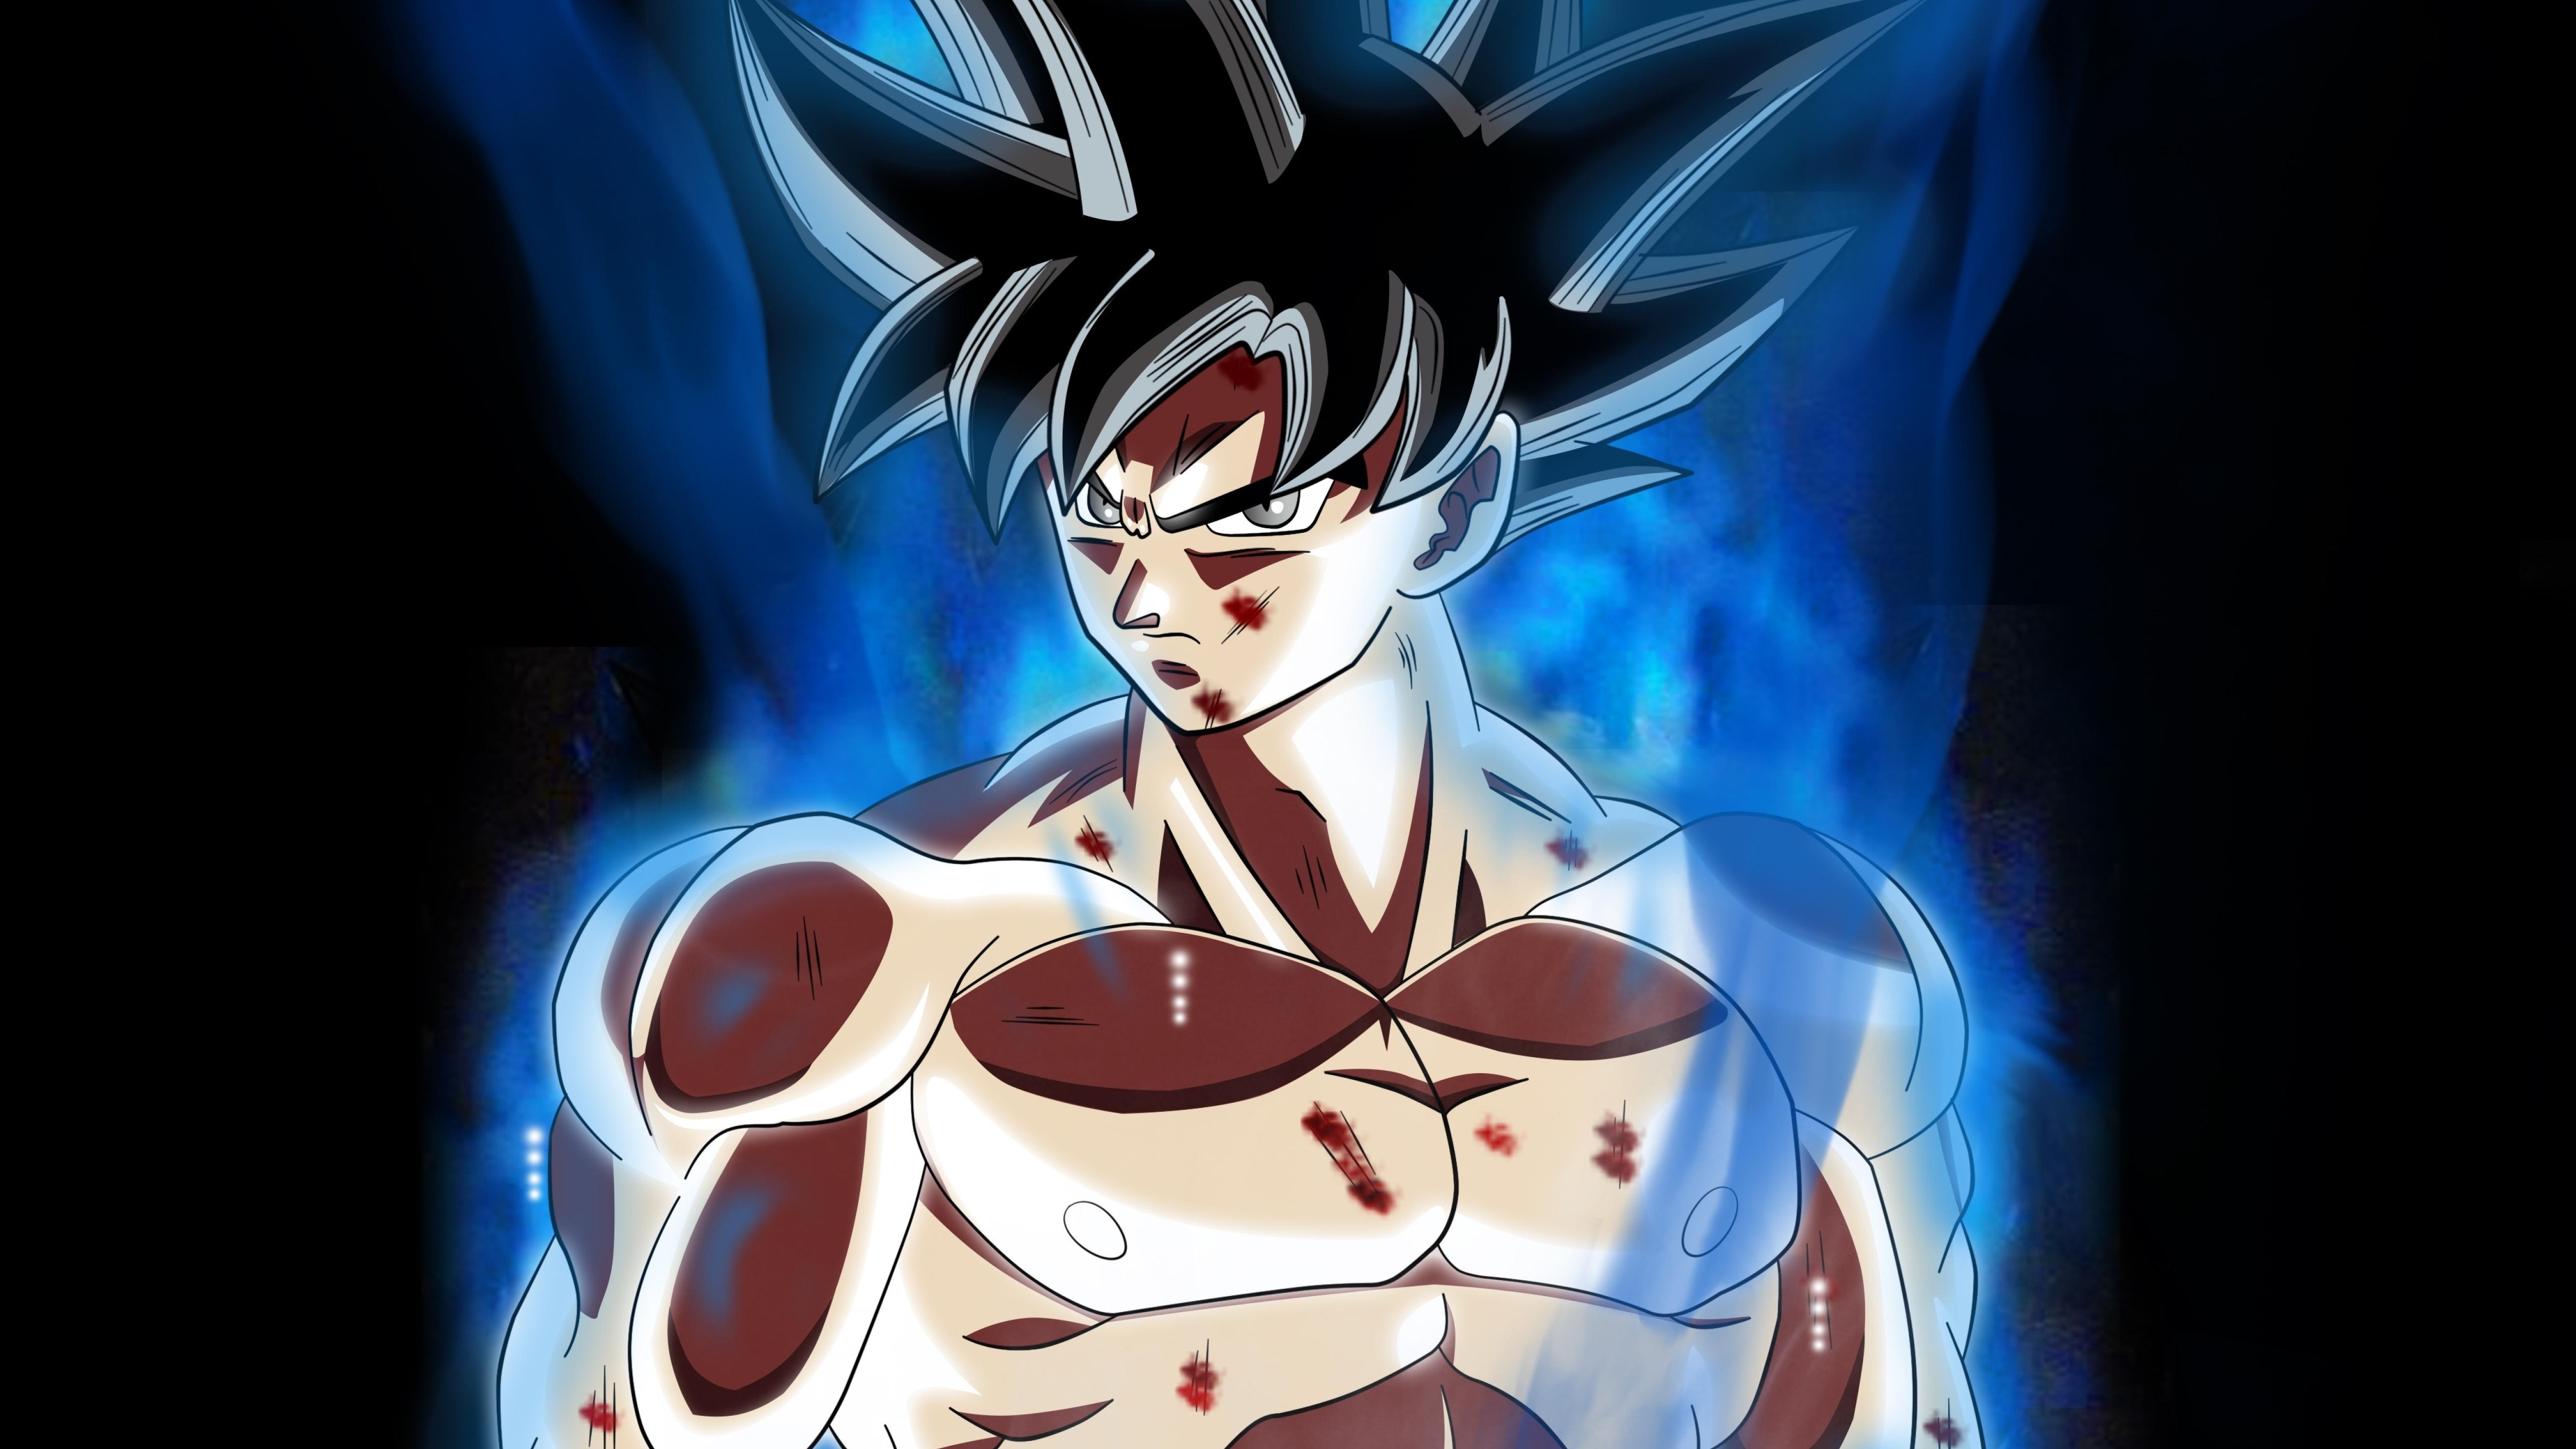 5120x2880 Goku Ultra Instinct Dragon Ball 5k Wallpaper Hd Anime 4k Wallpapers Images Photos And Background